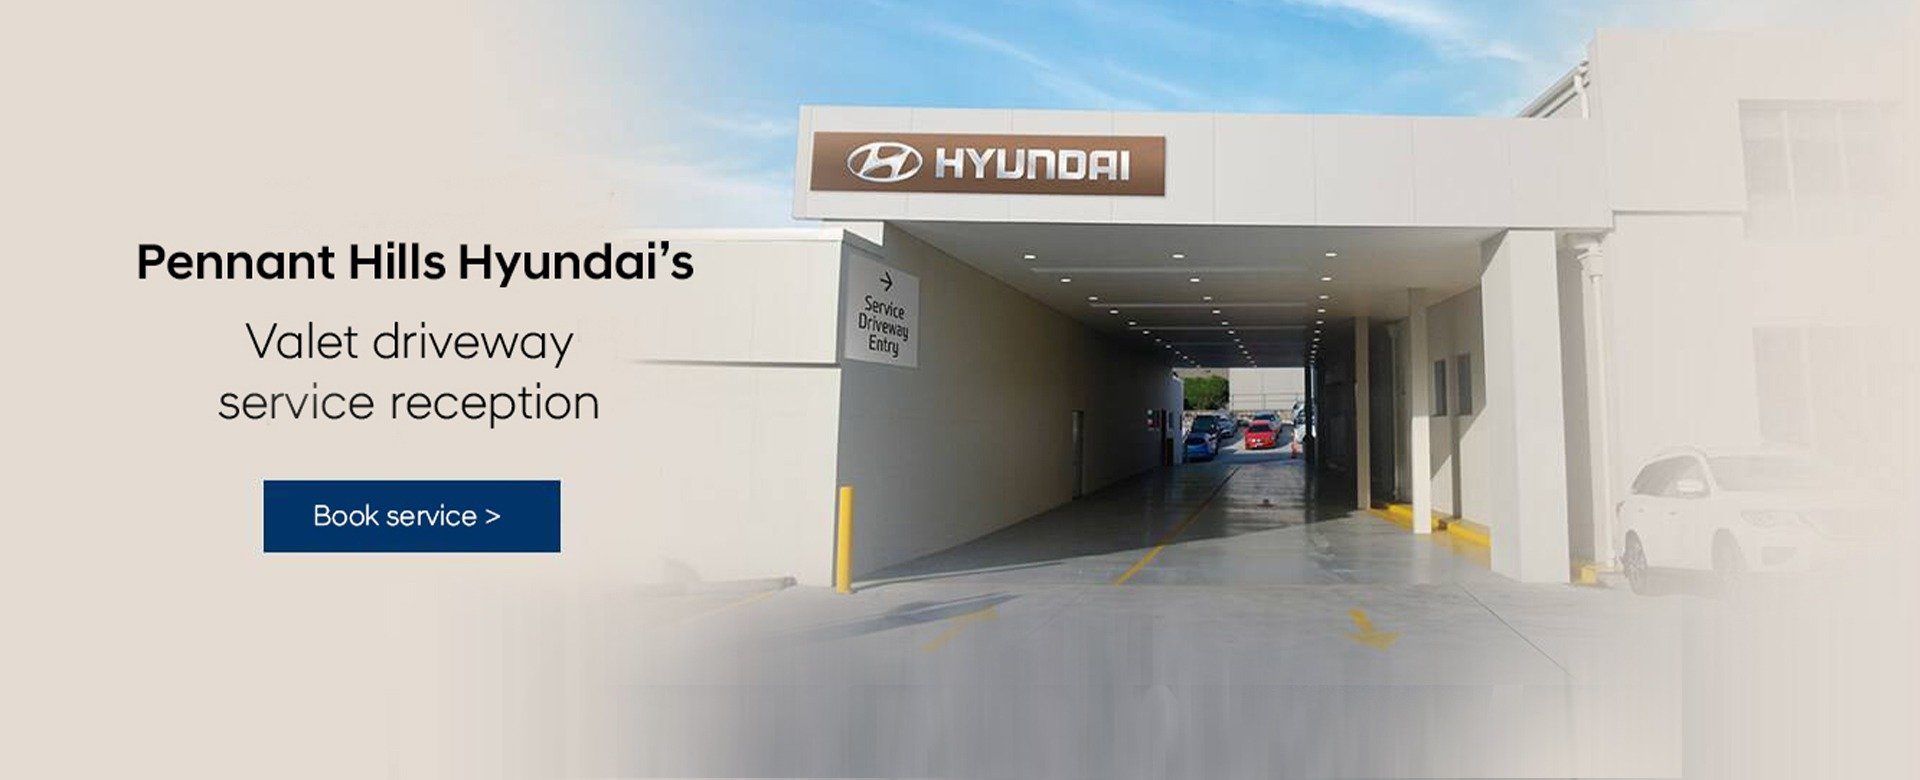 Pennant Hills Hyundai Service